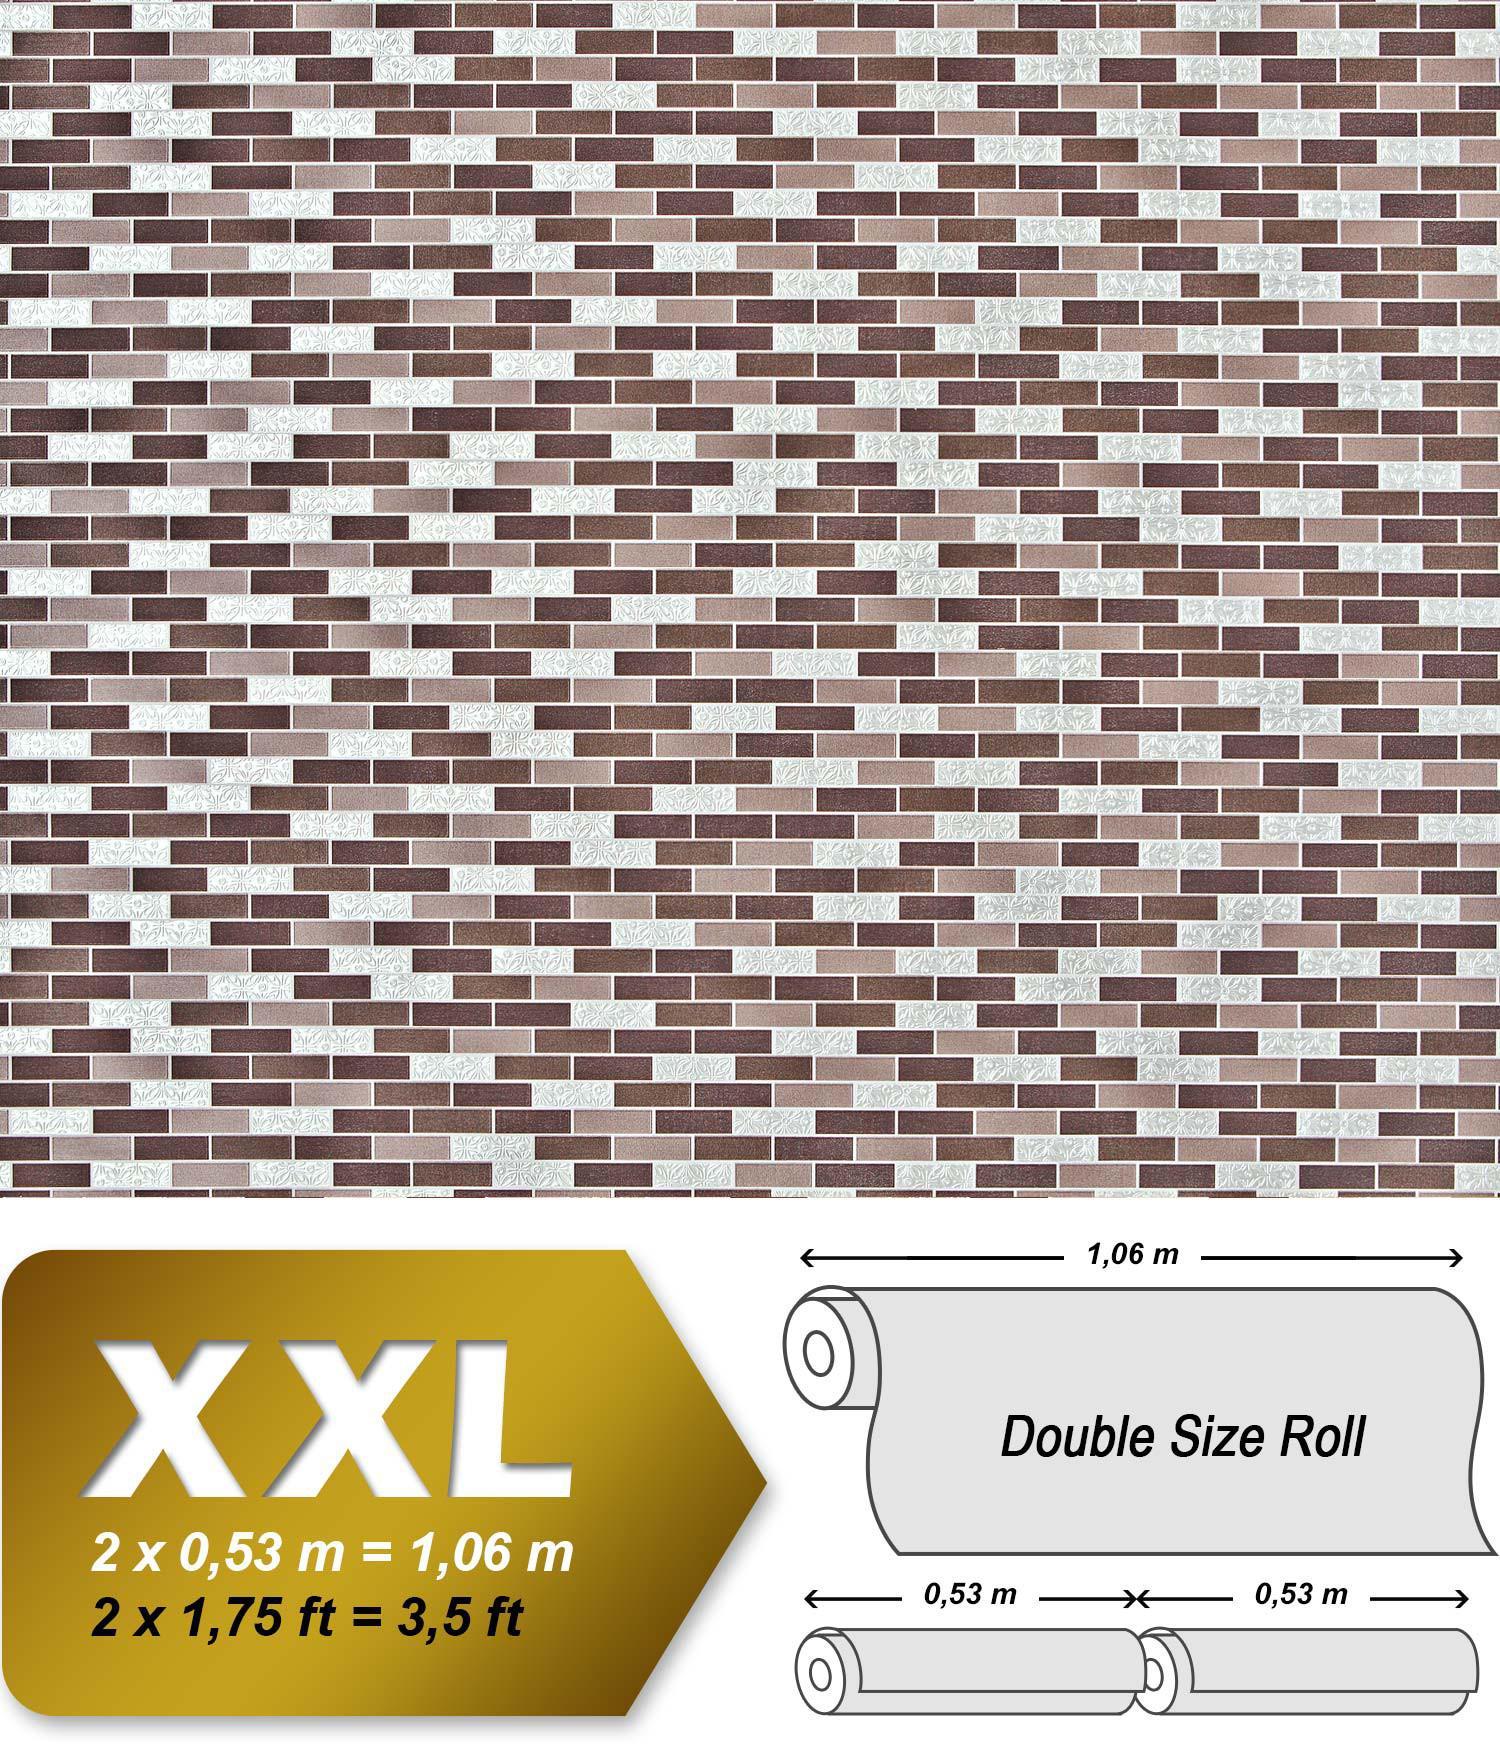 stein tapete kacheln xxl vliestapete edem 991 36 fliesen optik metallic ornamente braun taupe. Black Bedroom Furniture Sets. Home Design Ideas